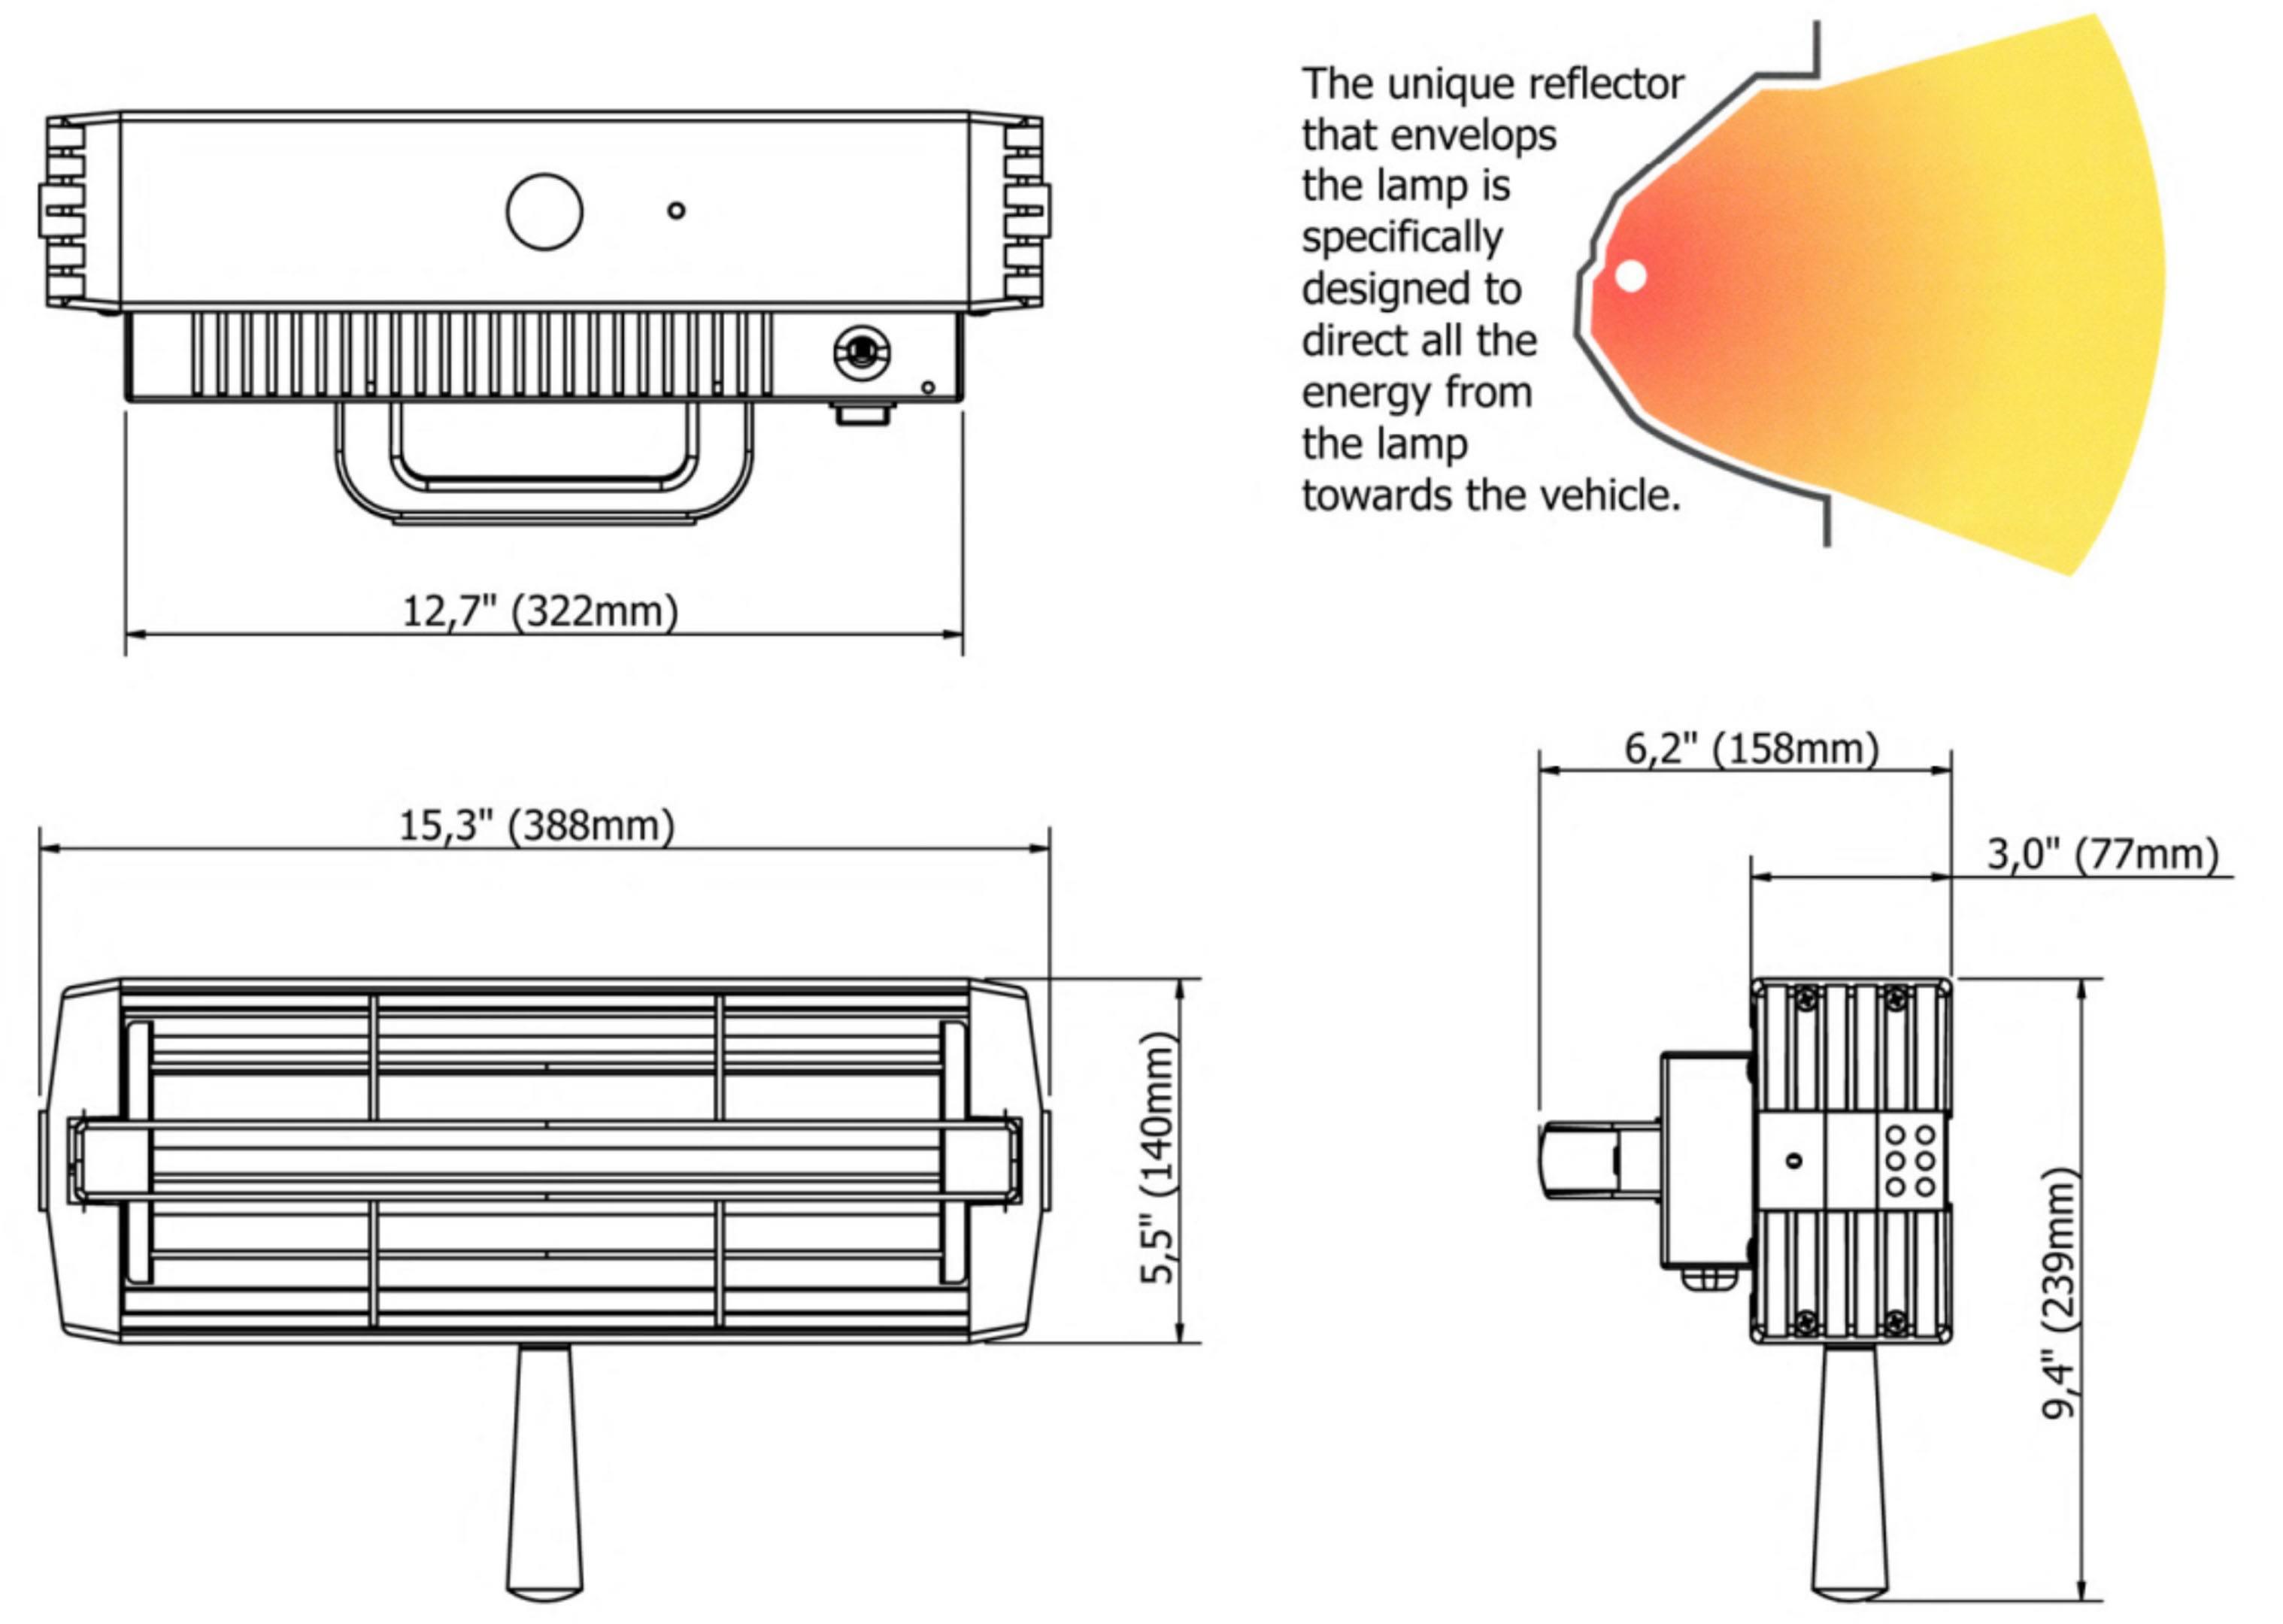 fuel pump wiring diagram for 1996 mustang beautiful bmw motorcycle wiring diagrams ensign the best ... orthman wiring diagram #9